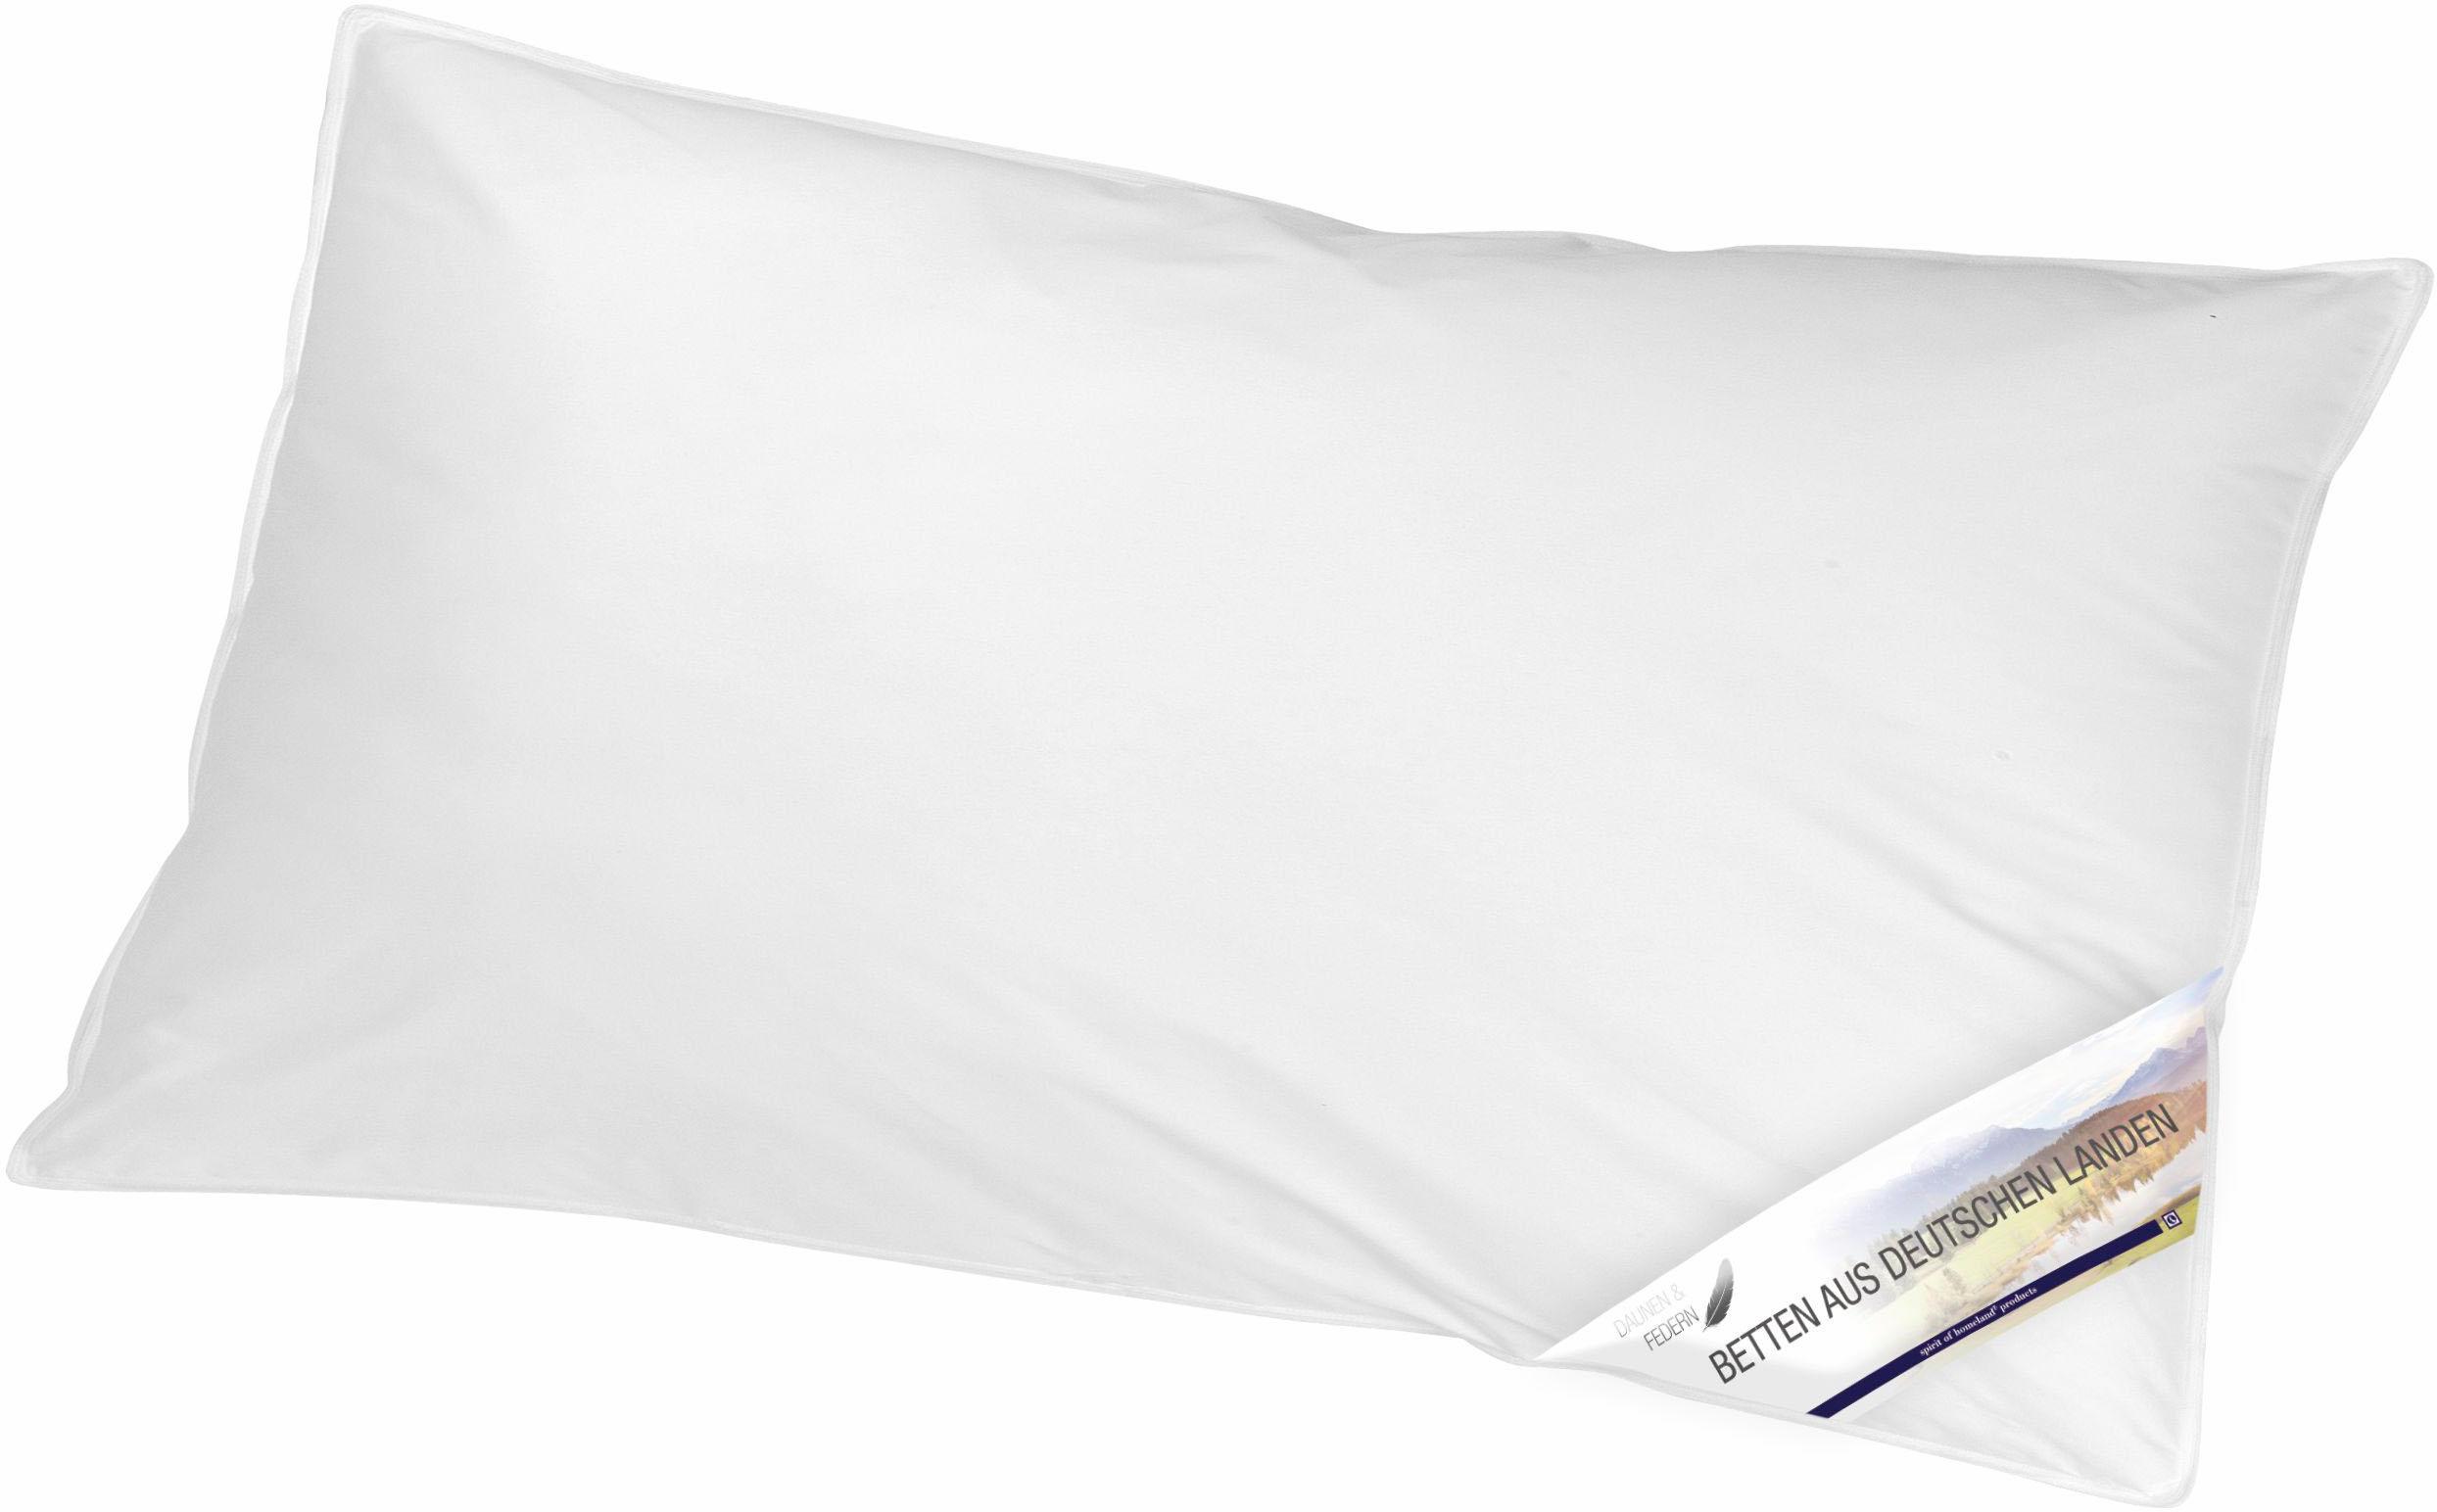 Federkissen Betten aus Deutschen Landen KBT Bettwaren Füllung: 70% Federn 30% Daunen